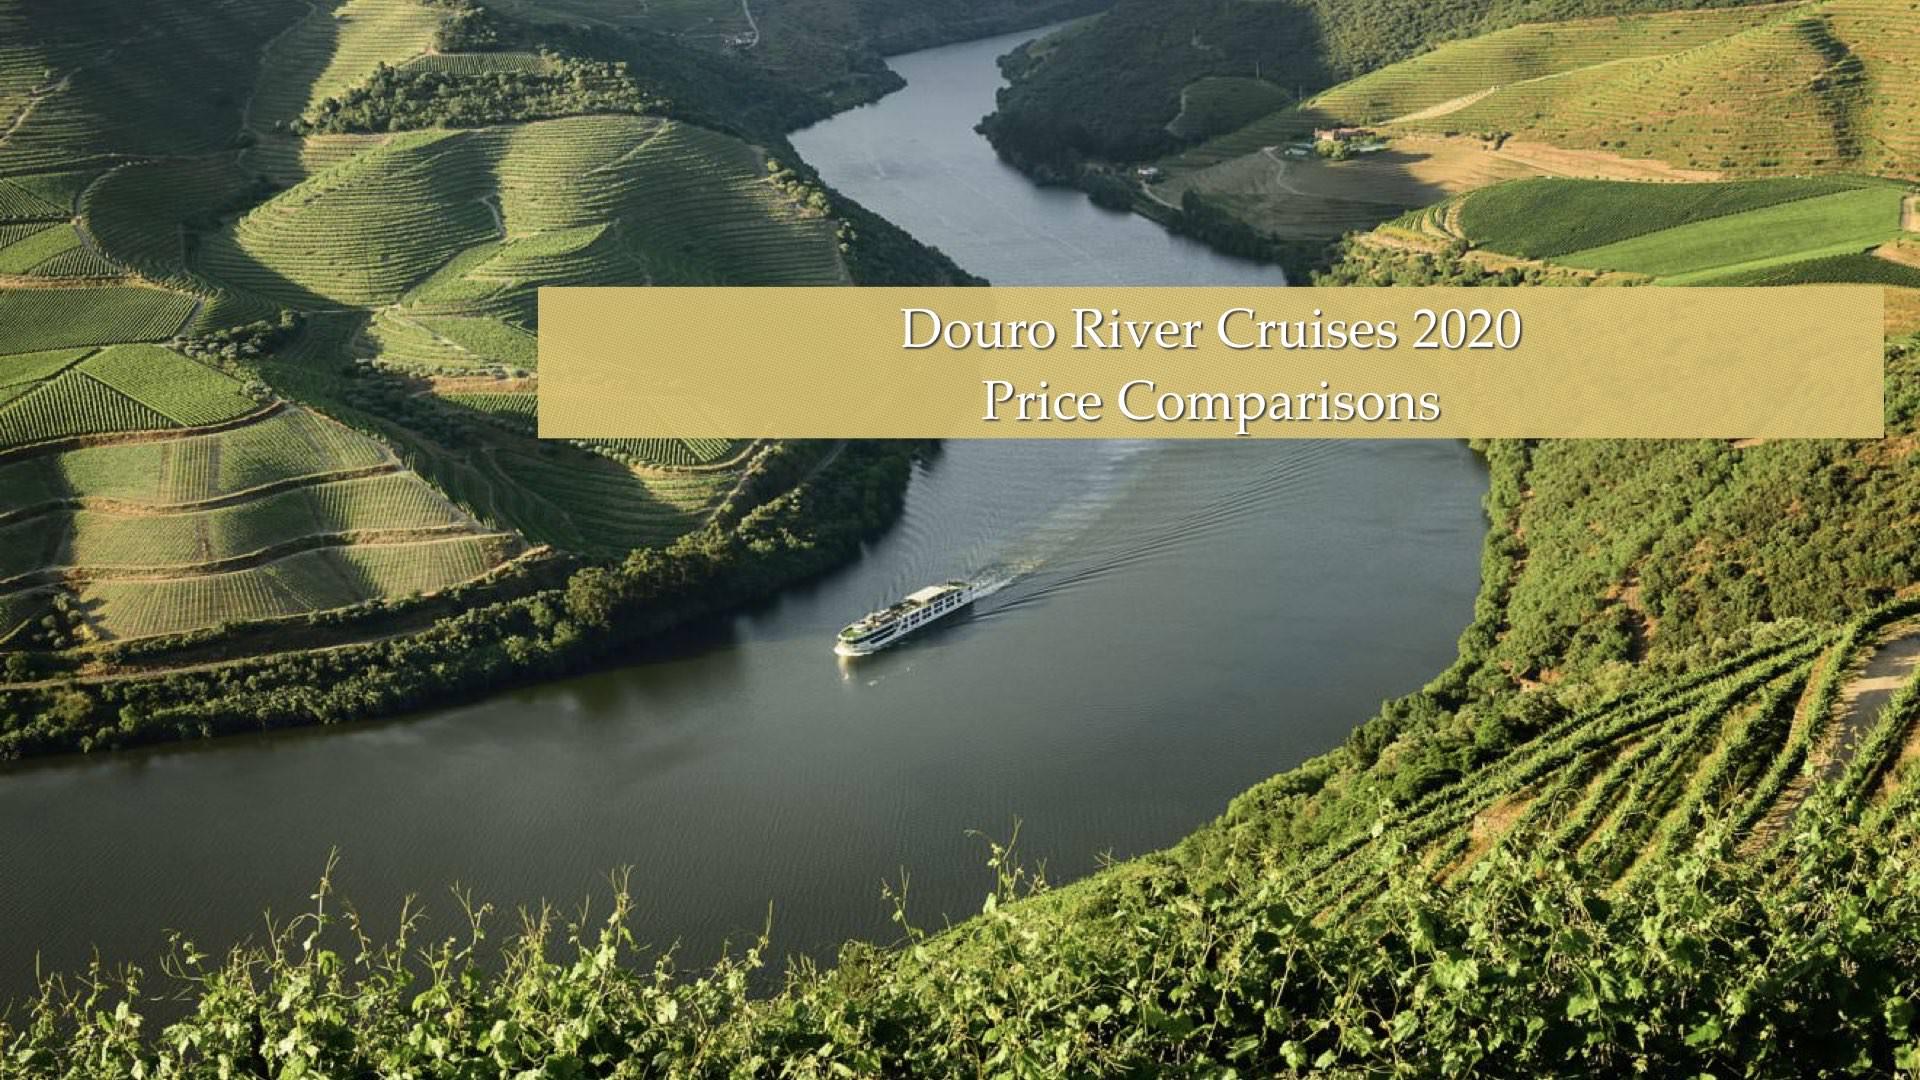 Douro 2020 pricing